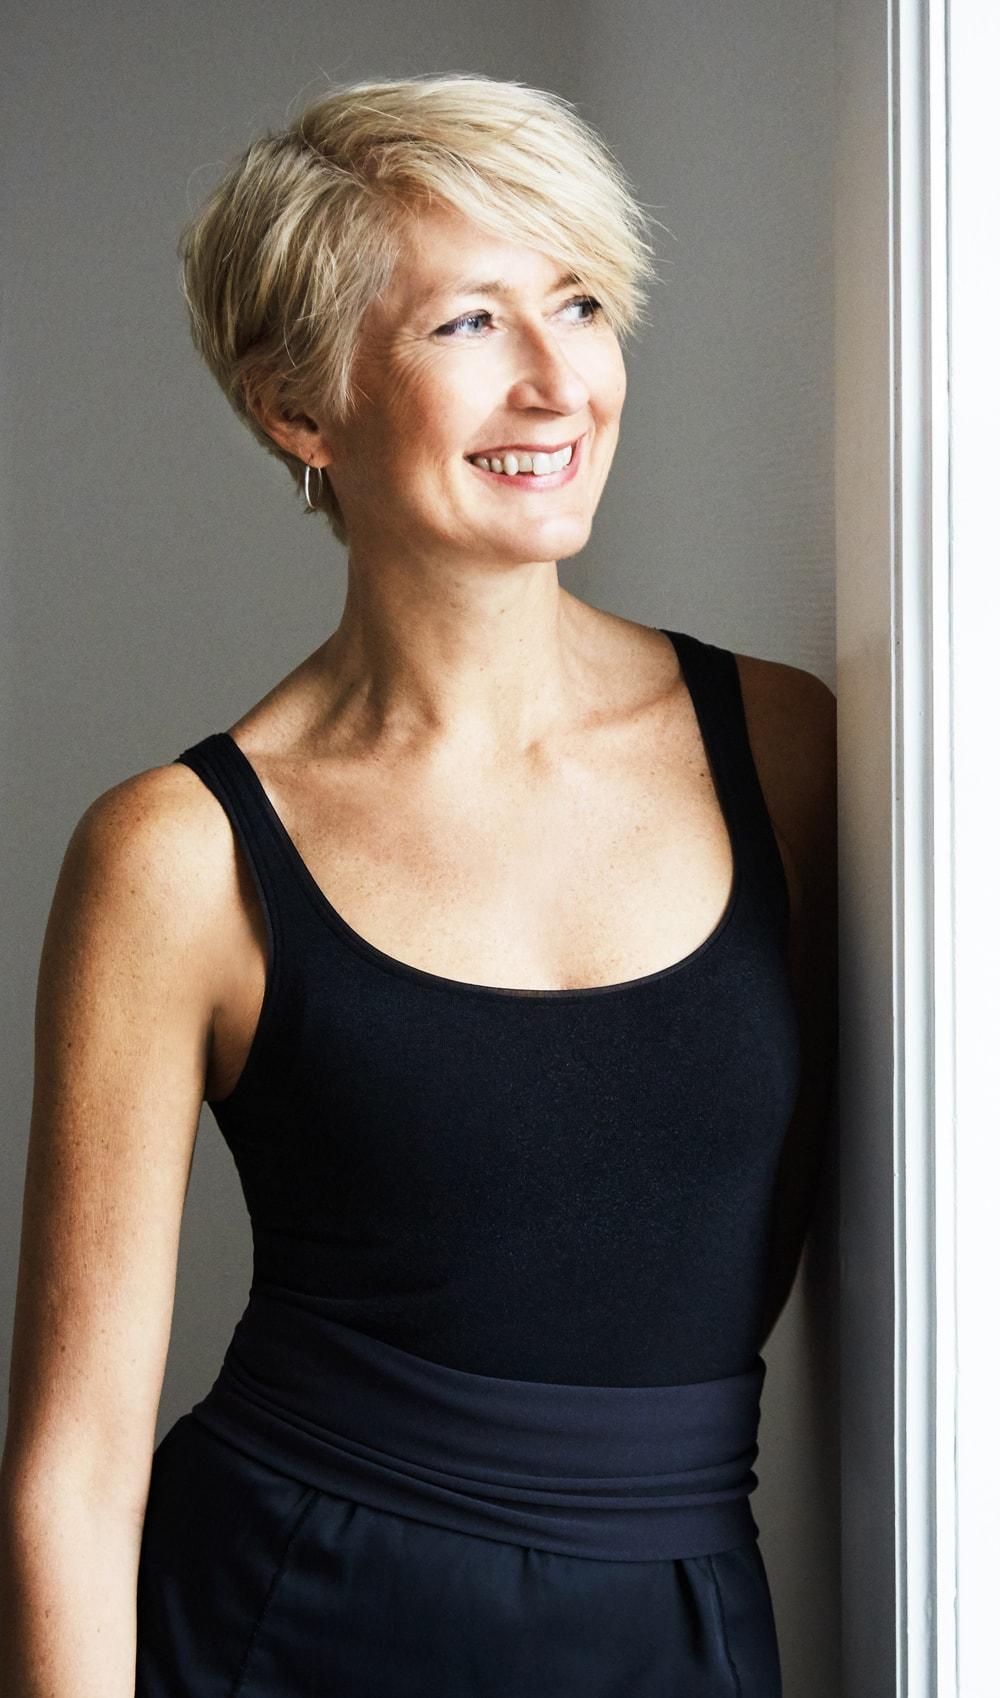 Huskdigselv - Izabella Winther - Zoneterapi - Kropsterapi